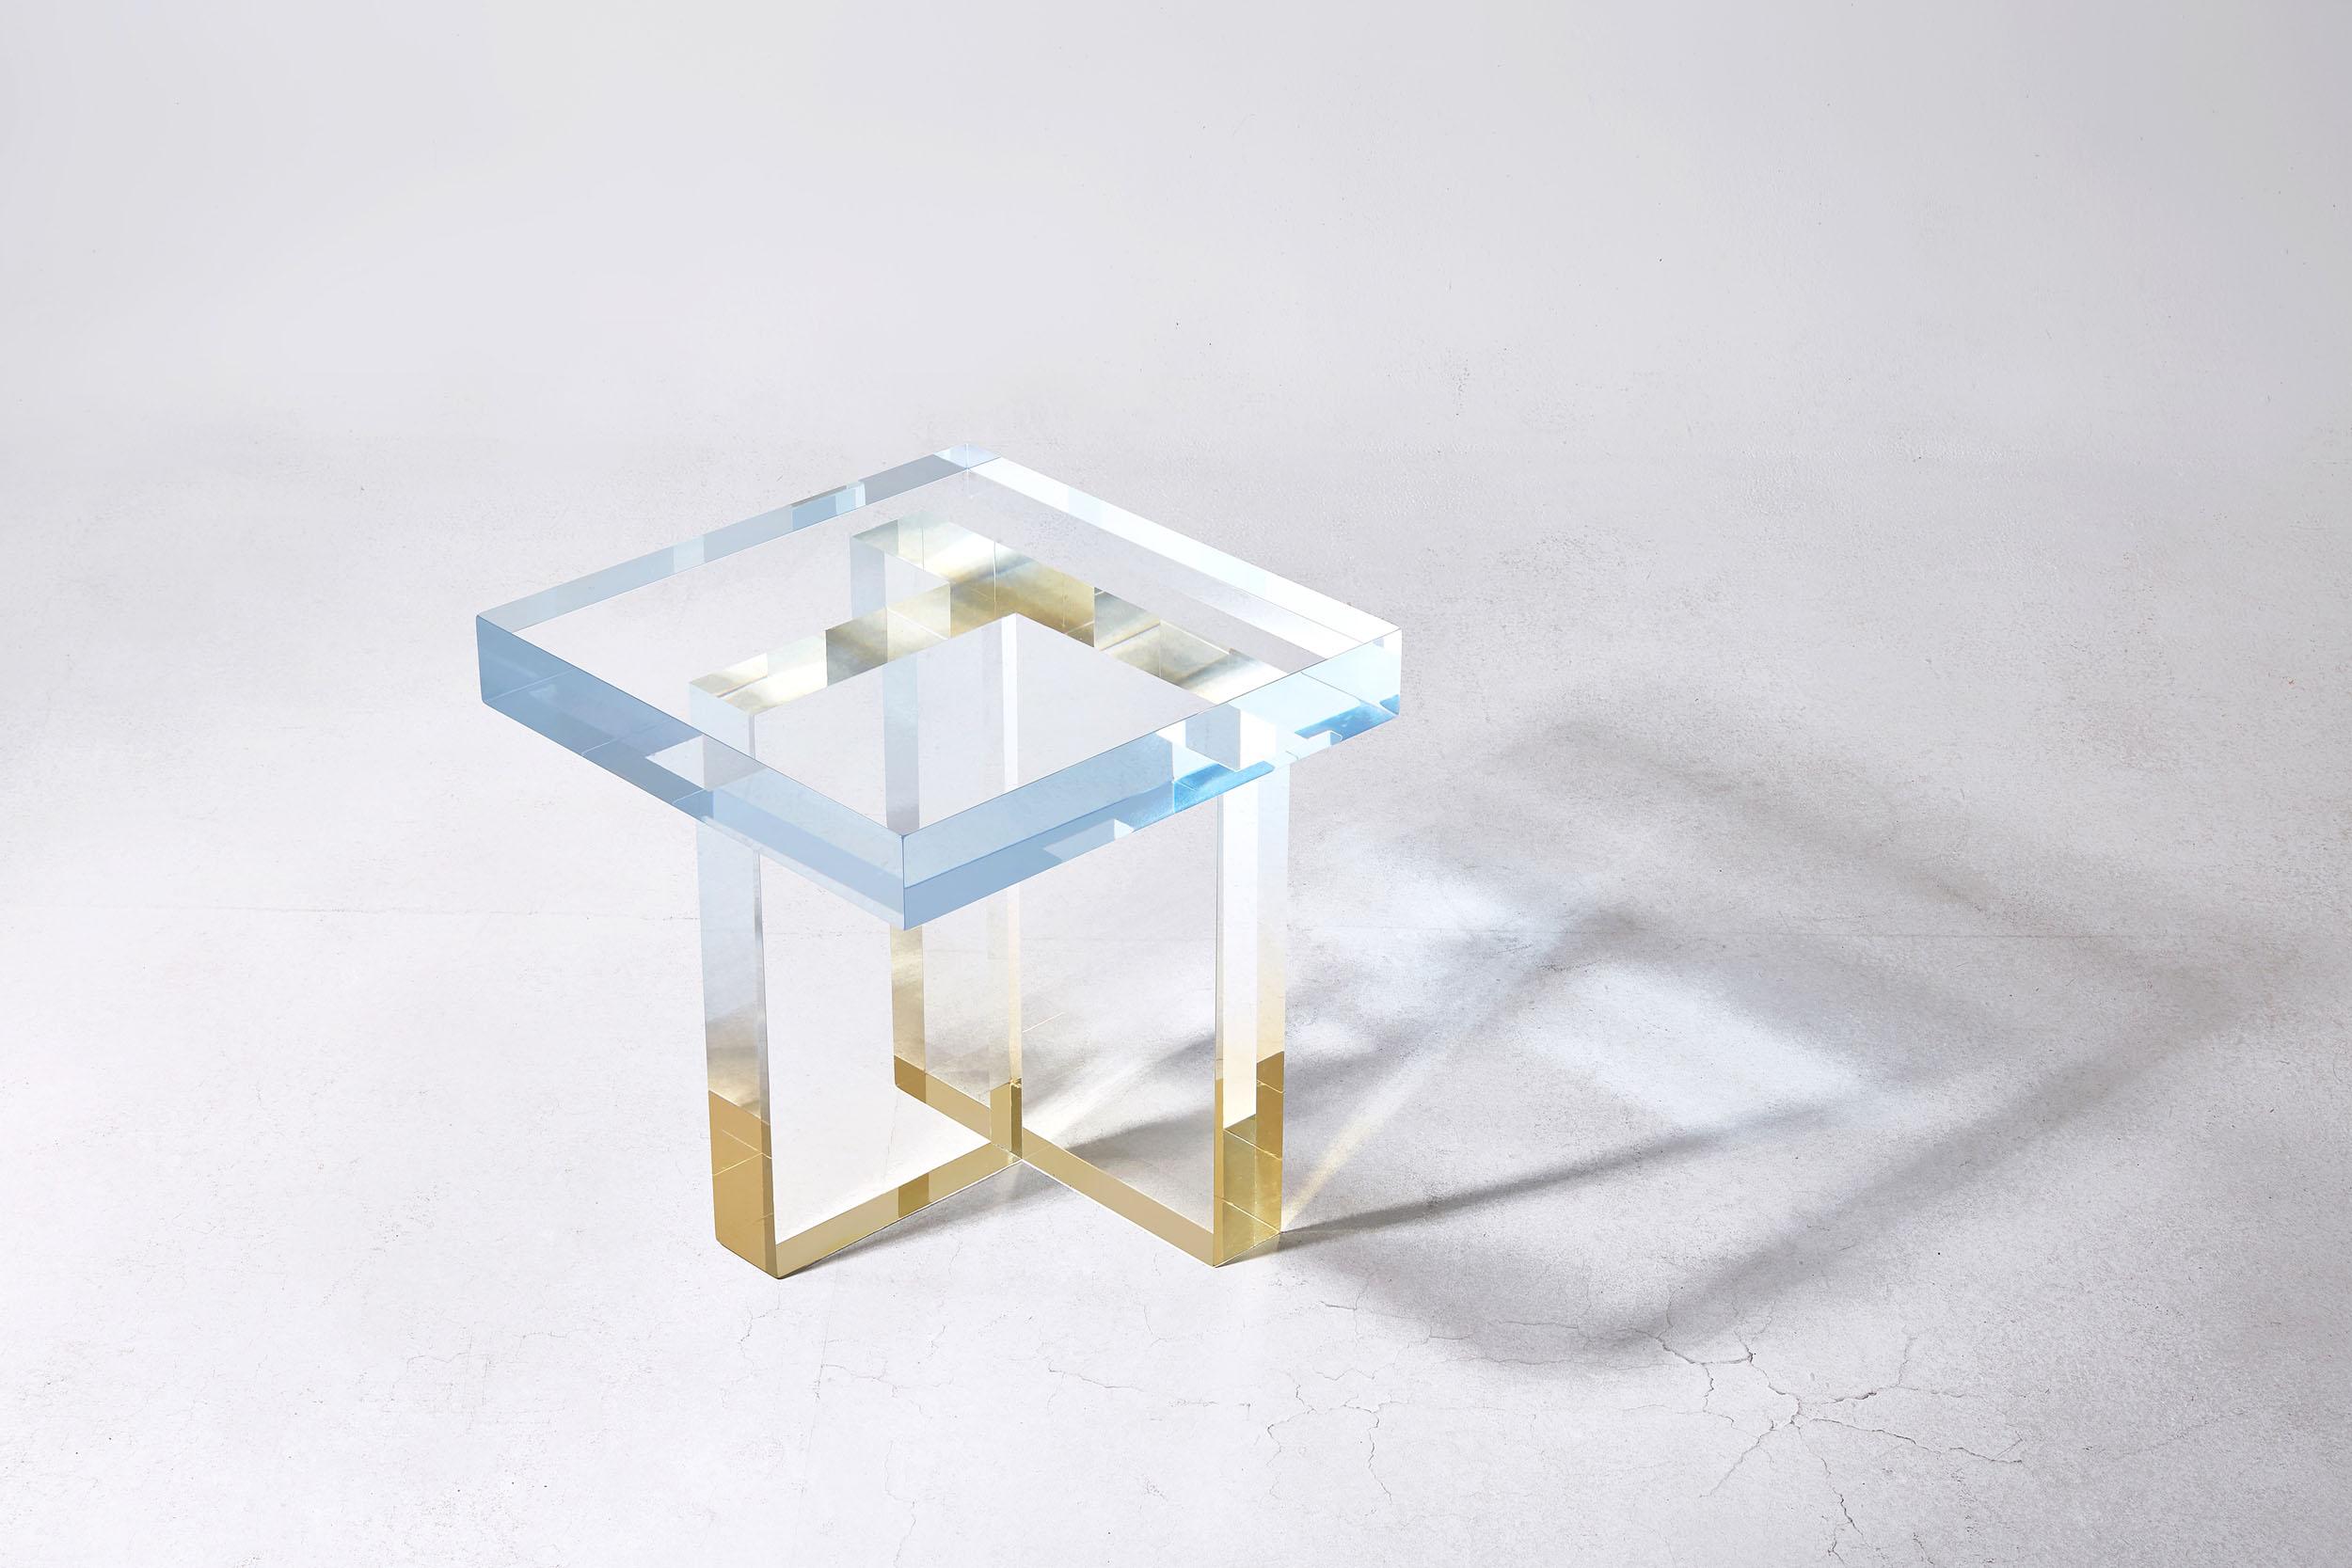 Crystal Series Table 1, Sky blue to yellow. Image source: Saerom Yoon